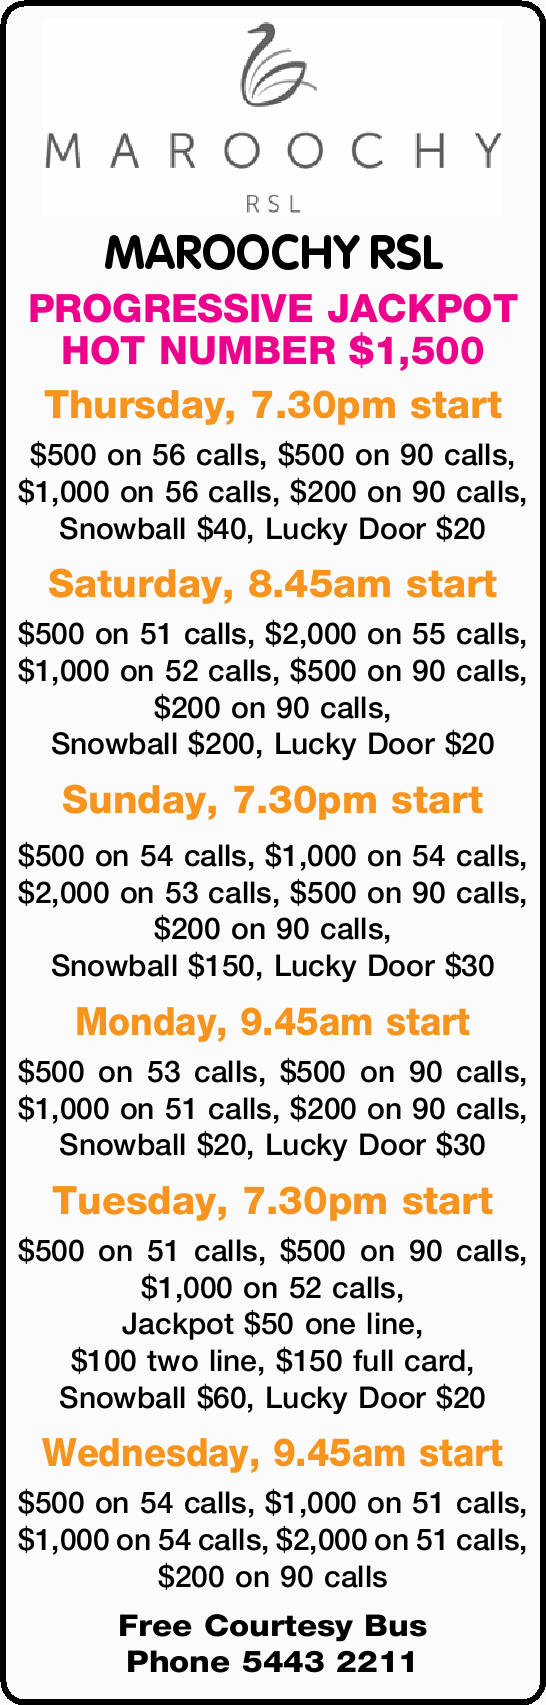 PROGRESSIVE JACKPOT HOT NUMBER $1,500   Thursday, 7.30pm start $500 on 56 calls, $500 on 90 c...